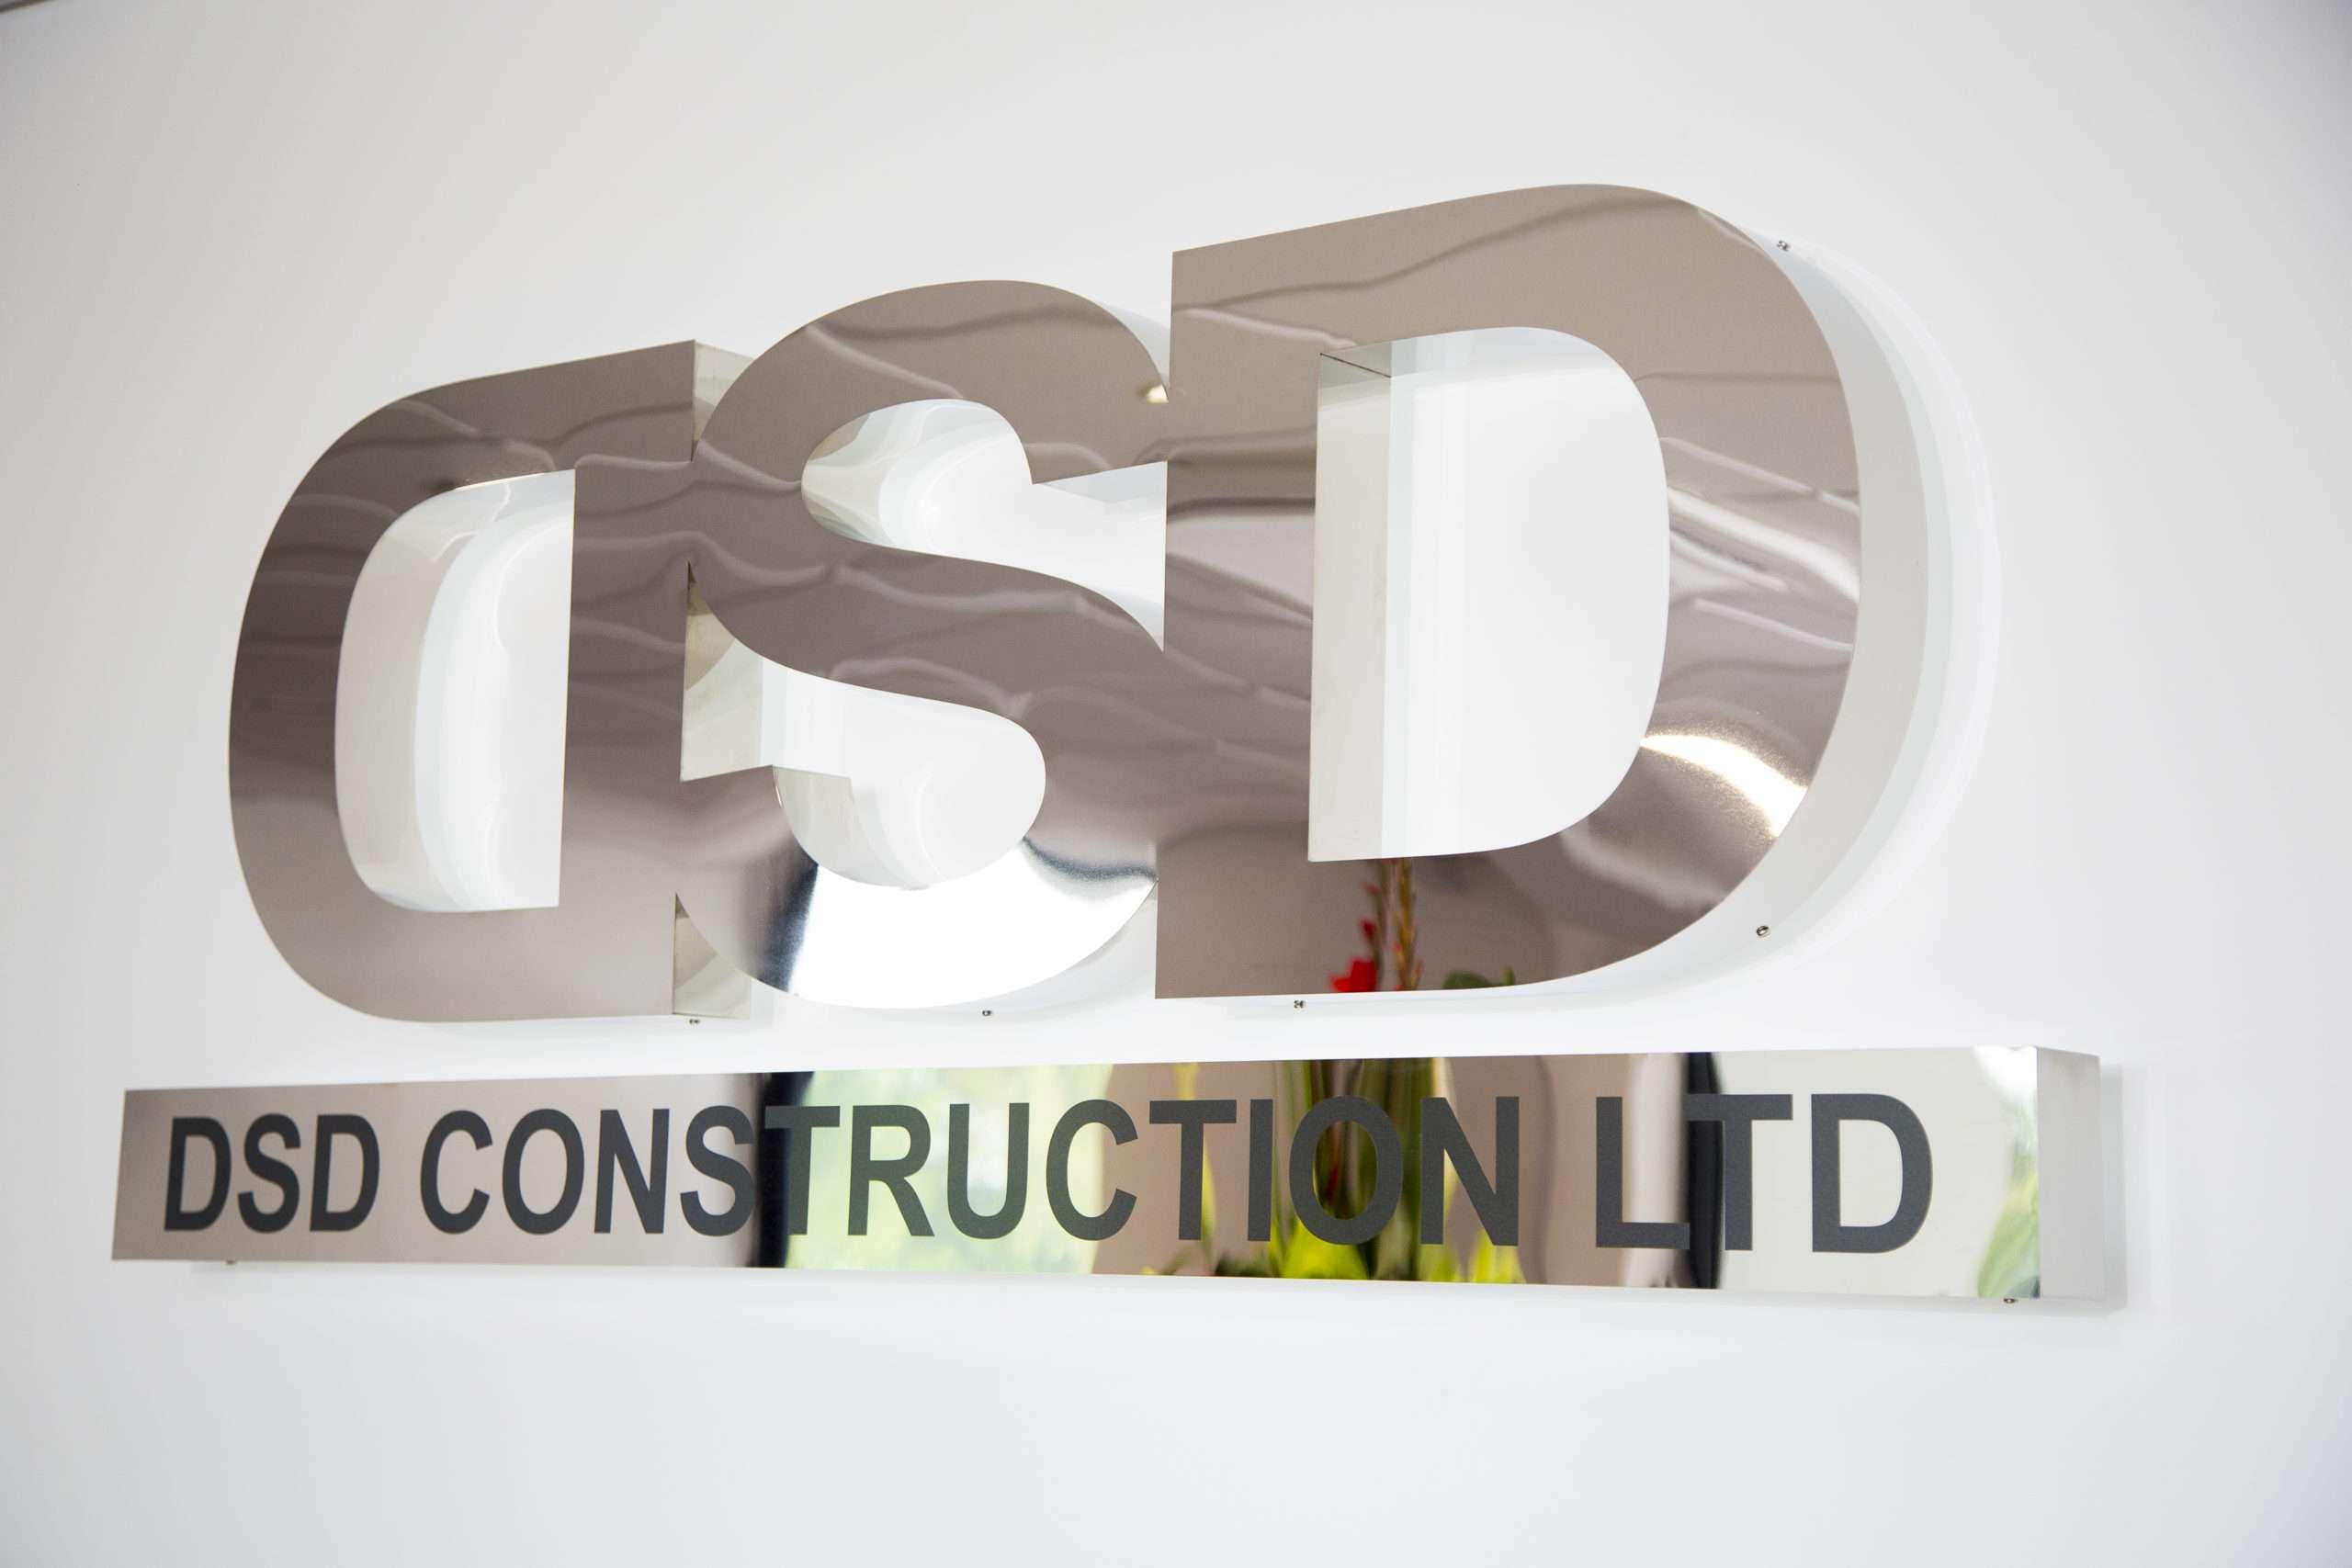 Metal DSD logo on wall